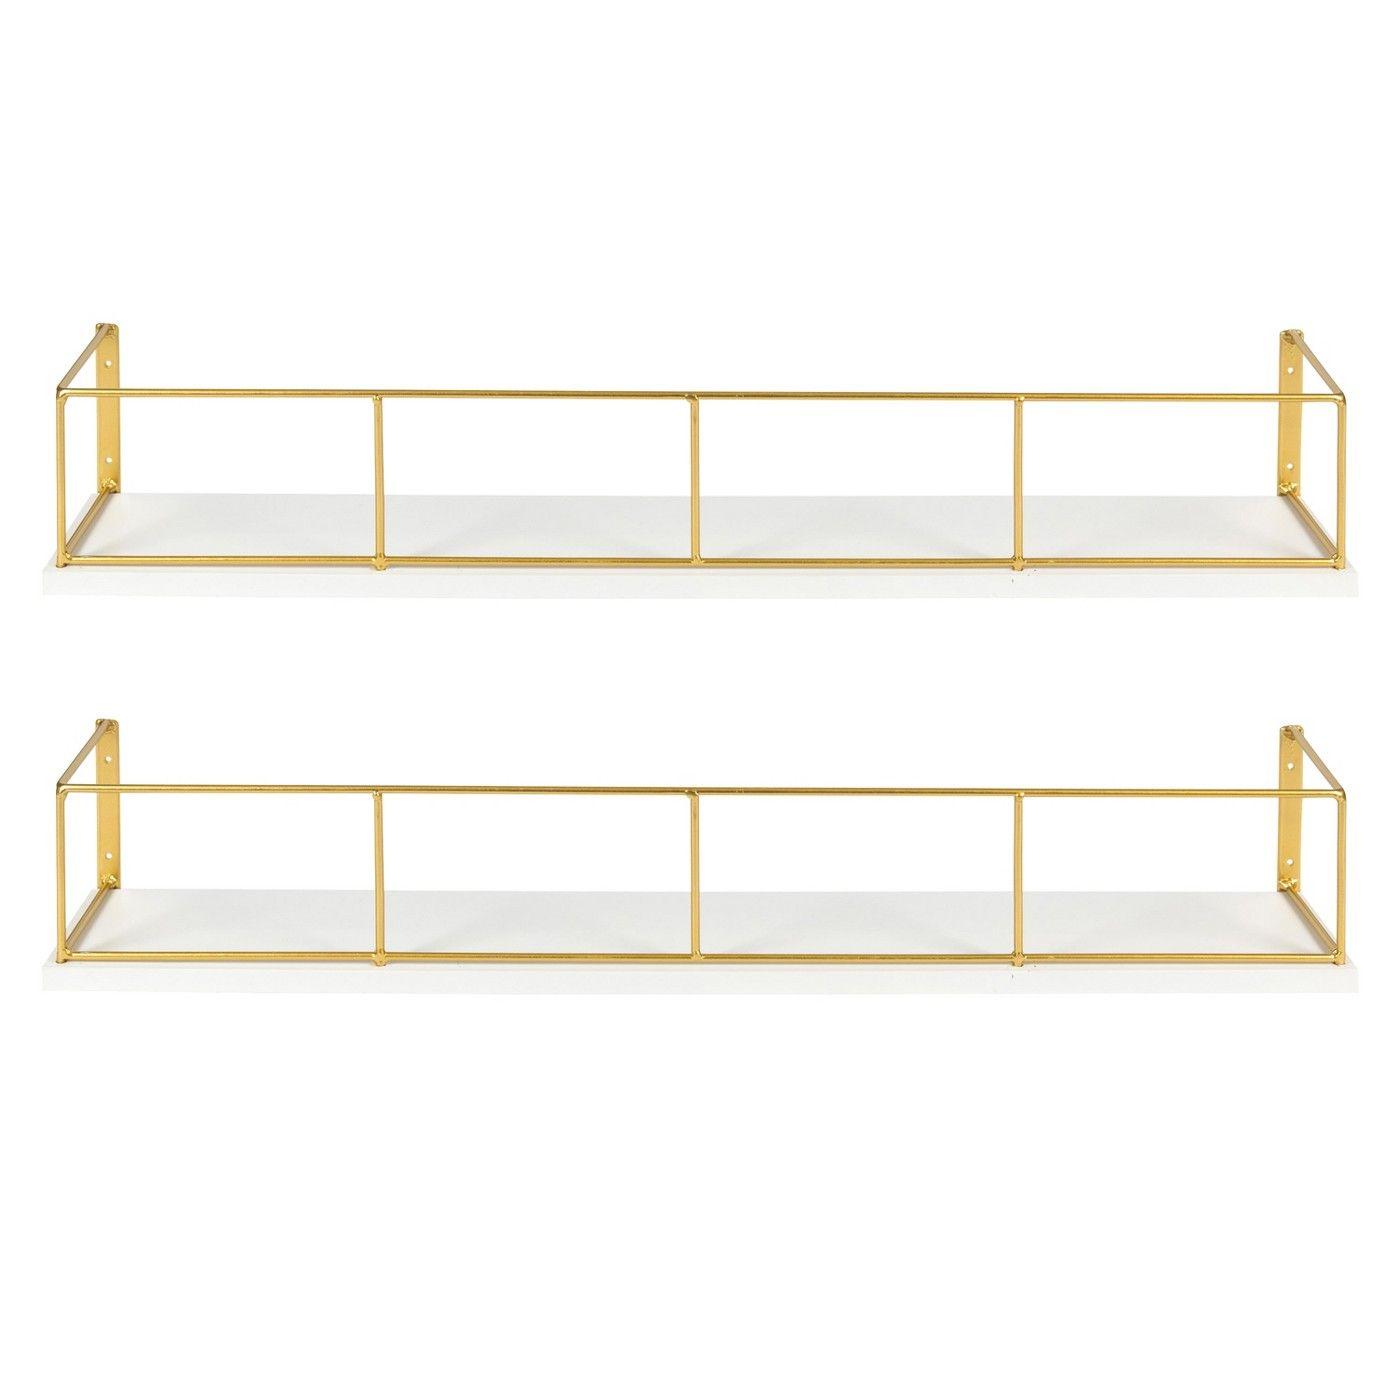 24 X 4 2pc Decorative Wall Shelf Set White Gold Uniek Wall